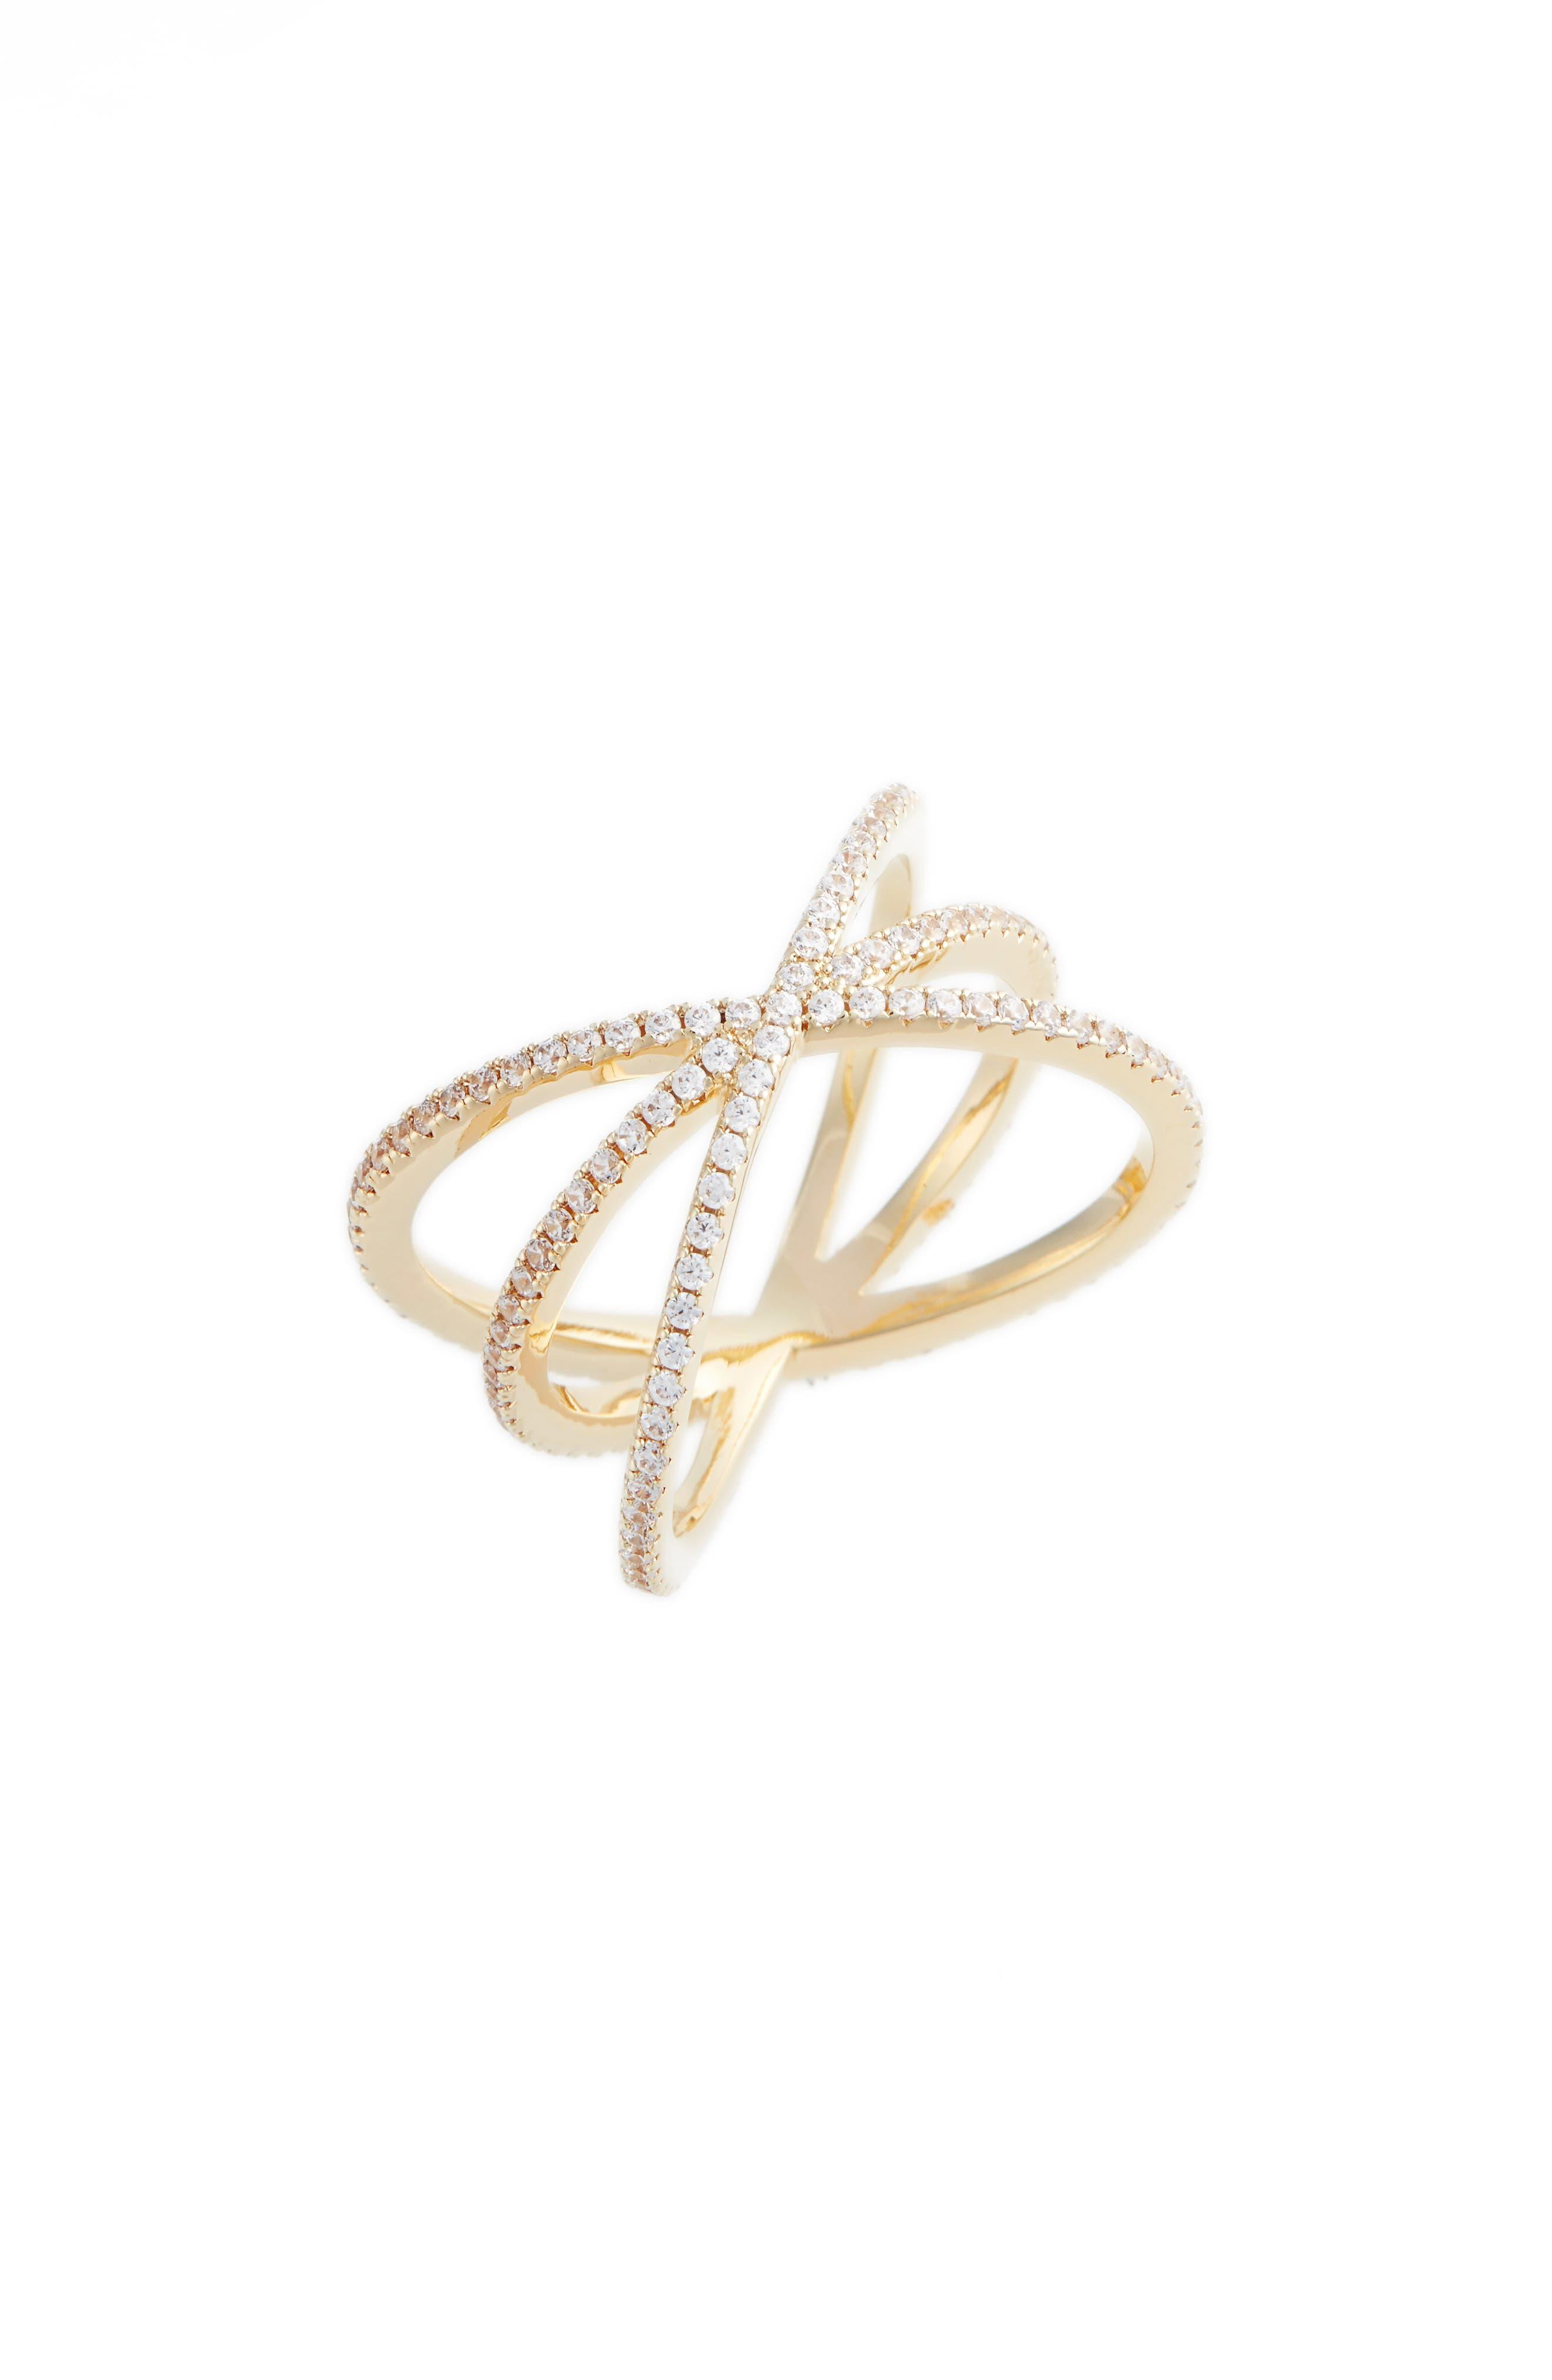 NORDSTROM, Pavé Crisscross Ring, Main thumbnail 1, color, CLEAR- GOLD